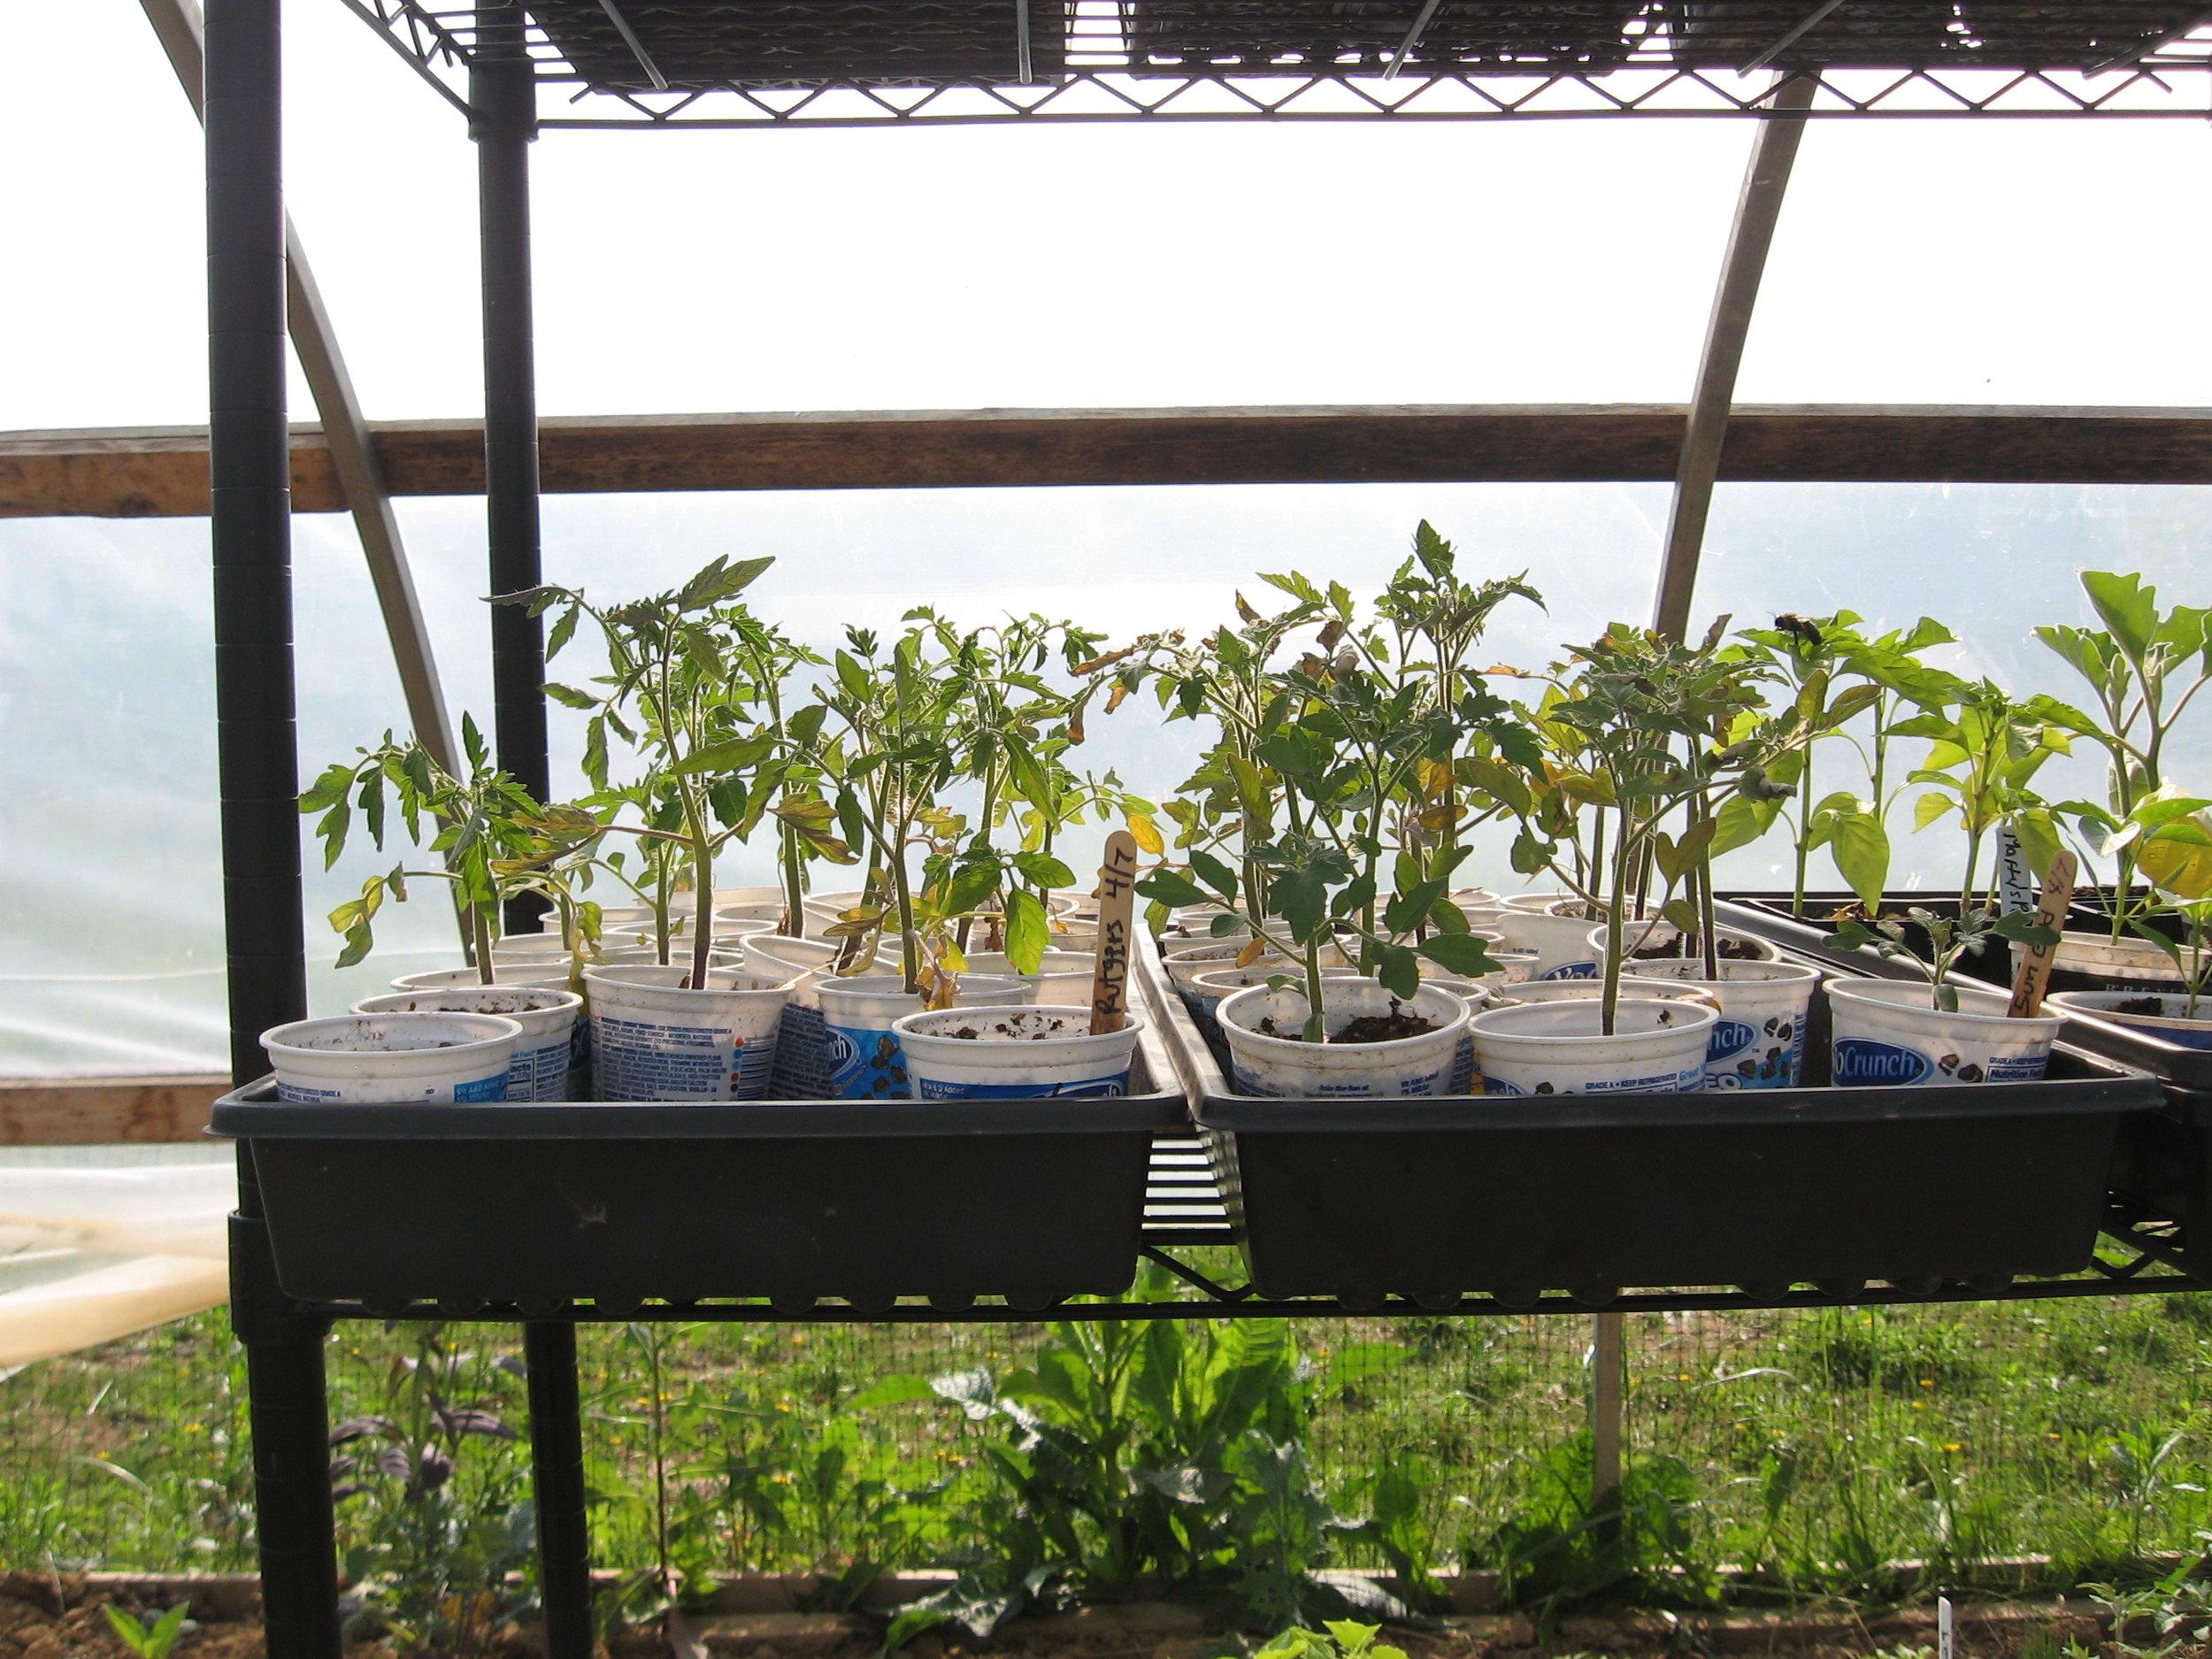 Tomato seedlings at Fox Run Environmental Education Center